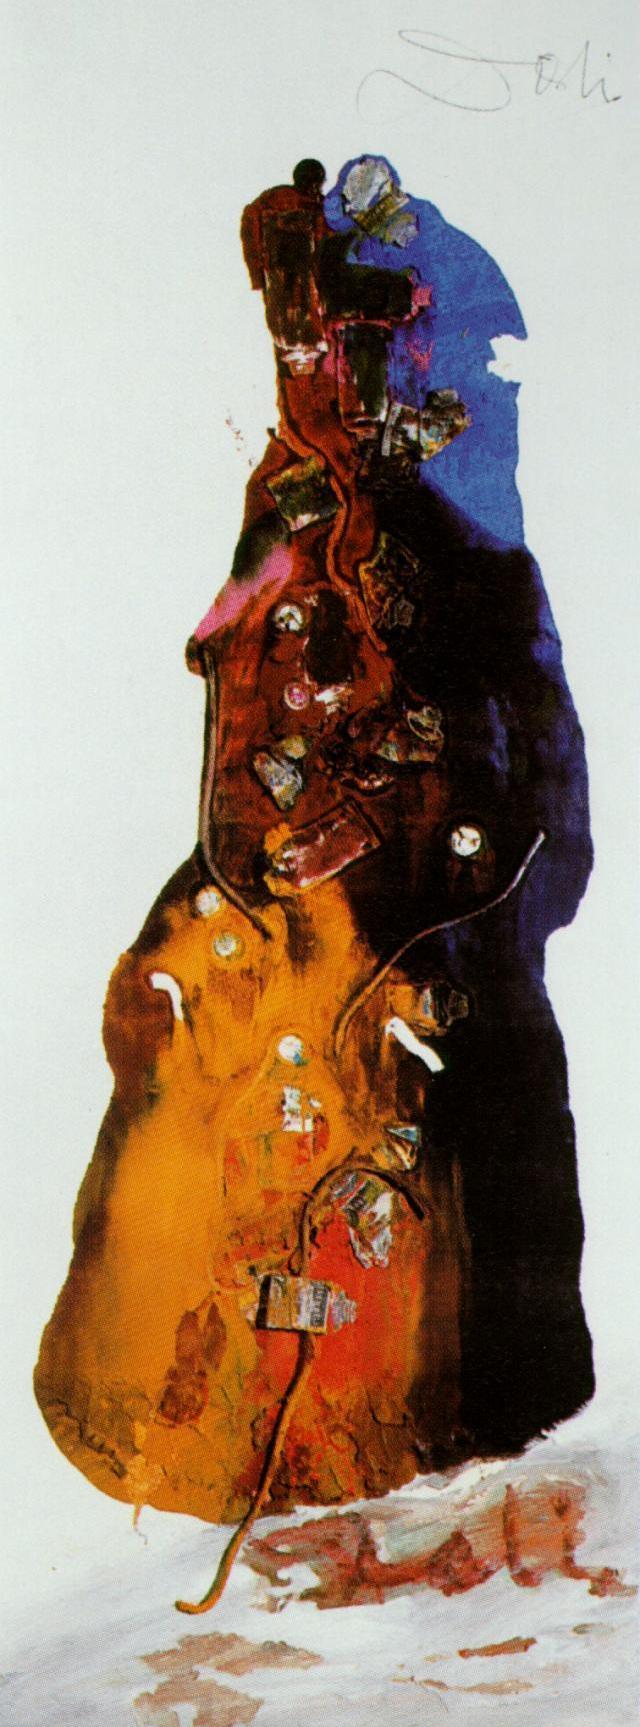 Untitled (The Lady of Avignon), 1960, Salvador Dali